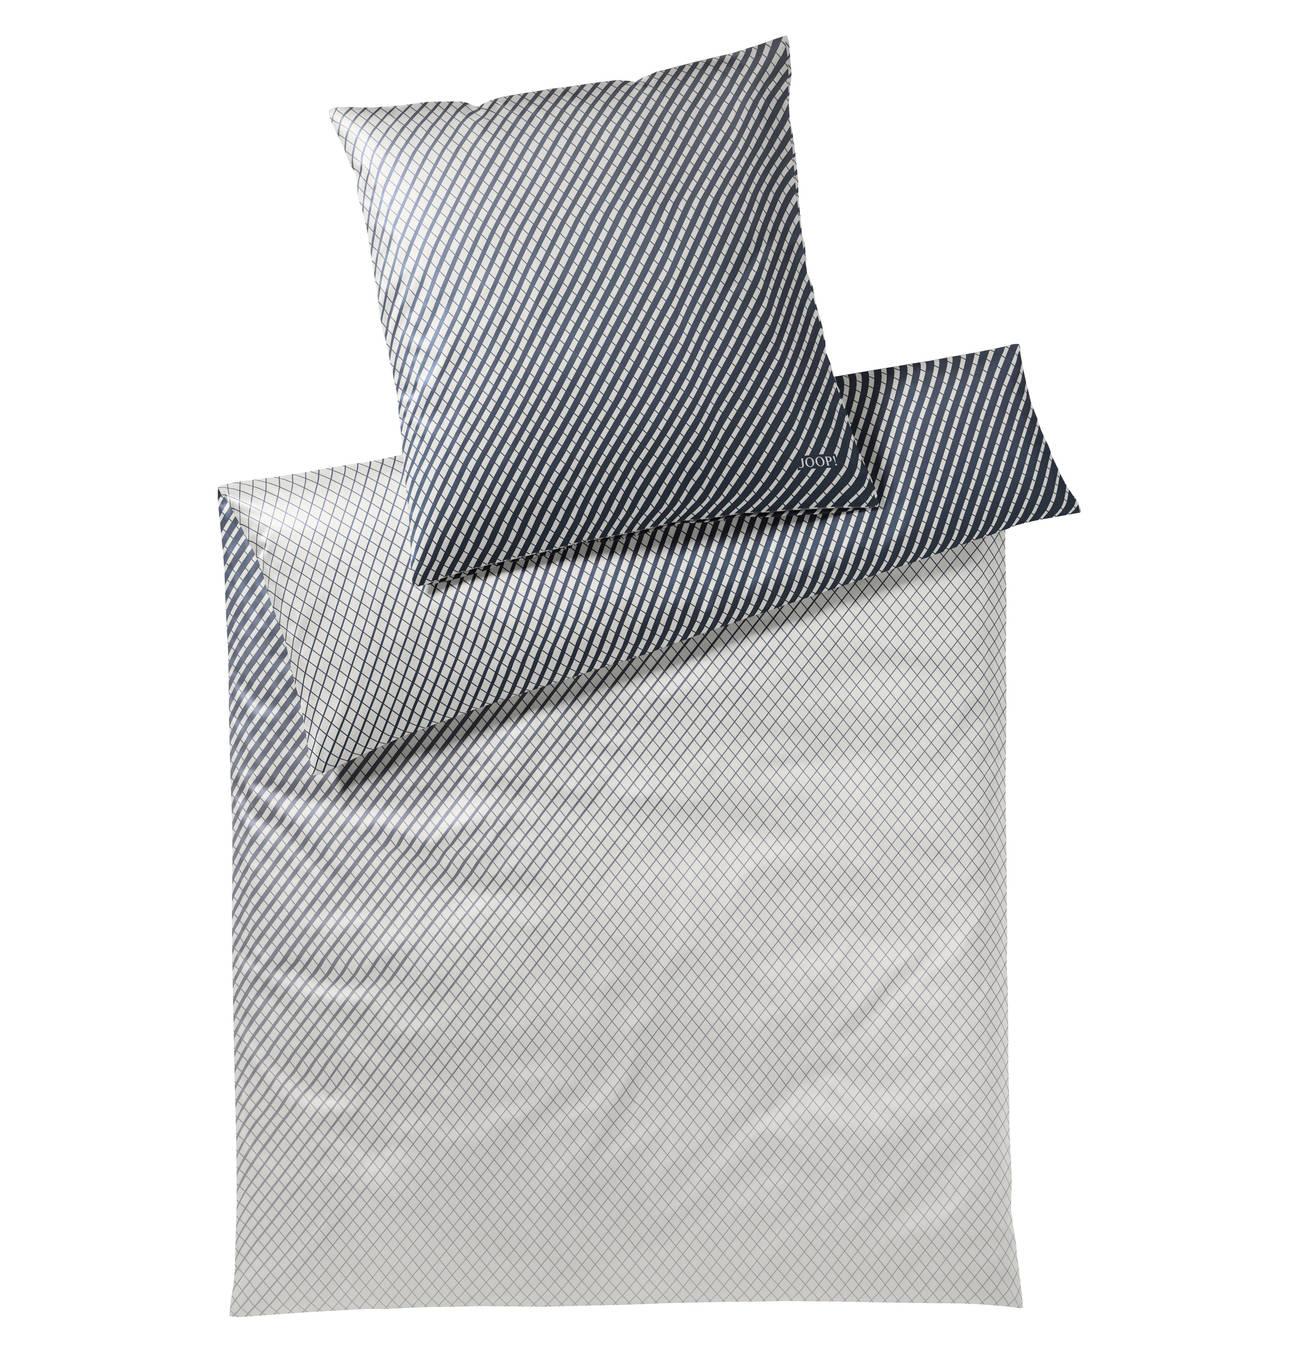 Kissenbezug Diamond 100 Baumwolle Rauten Muster Mako Satin